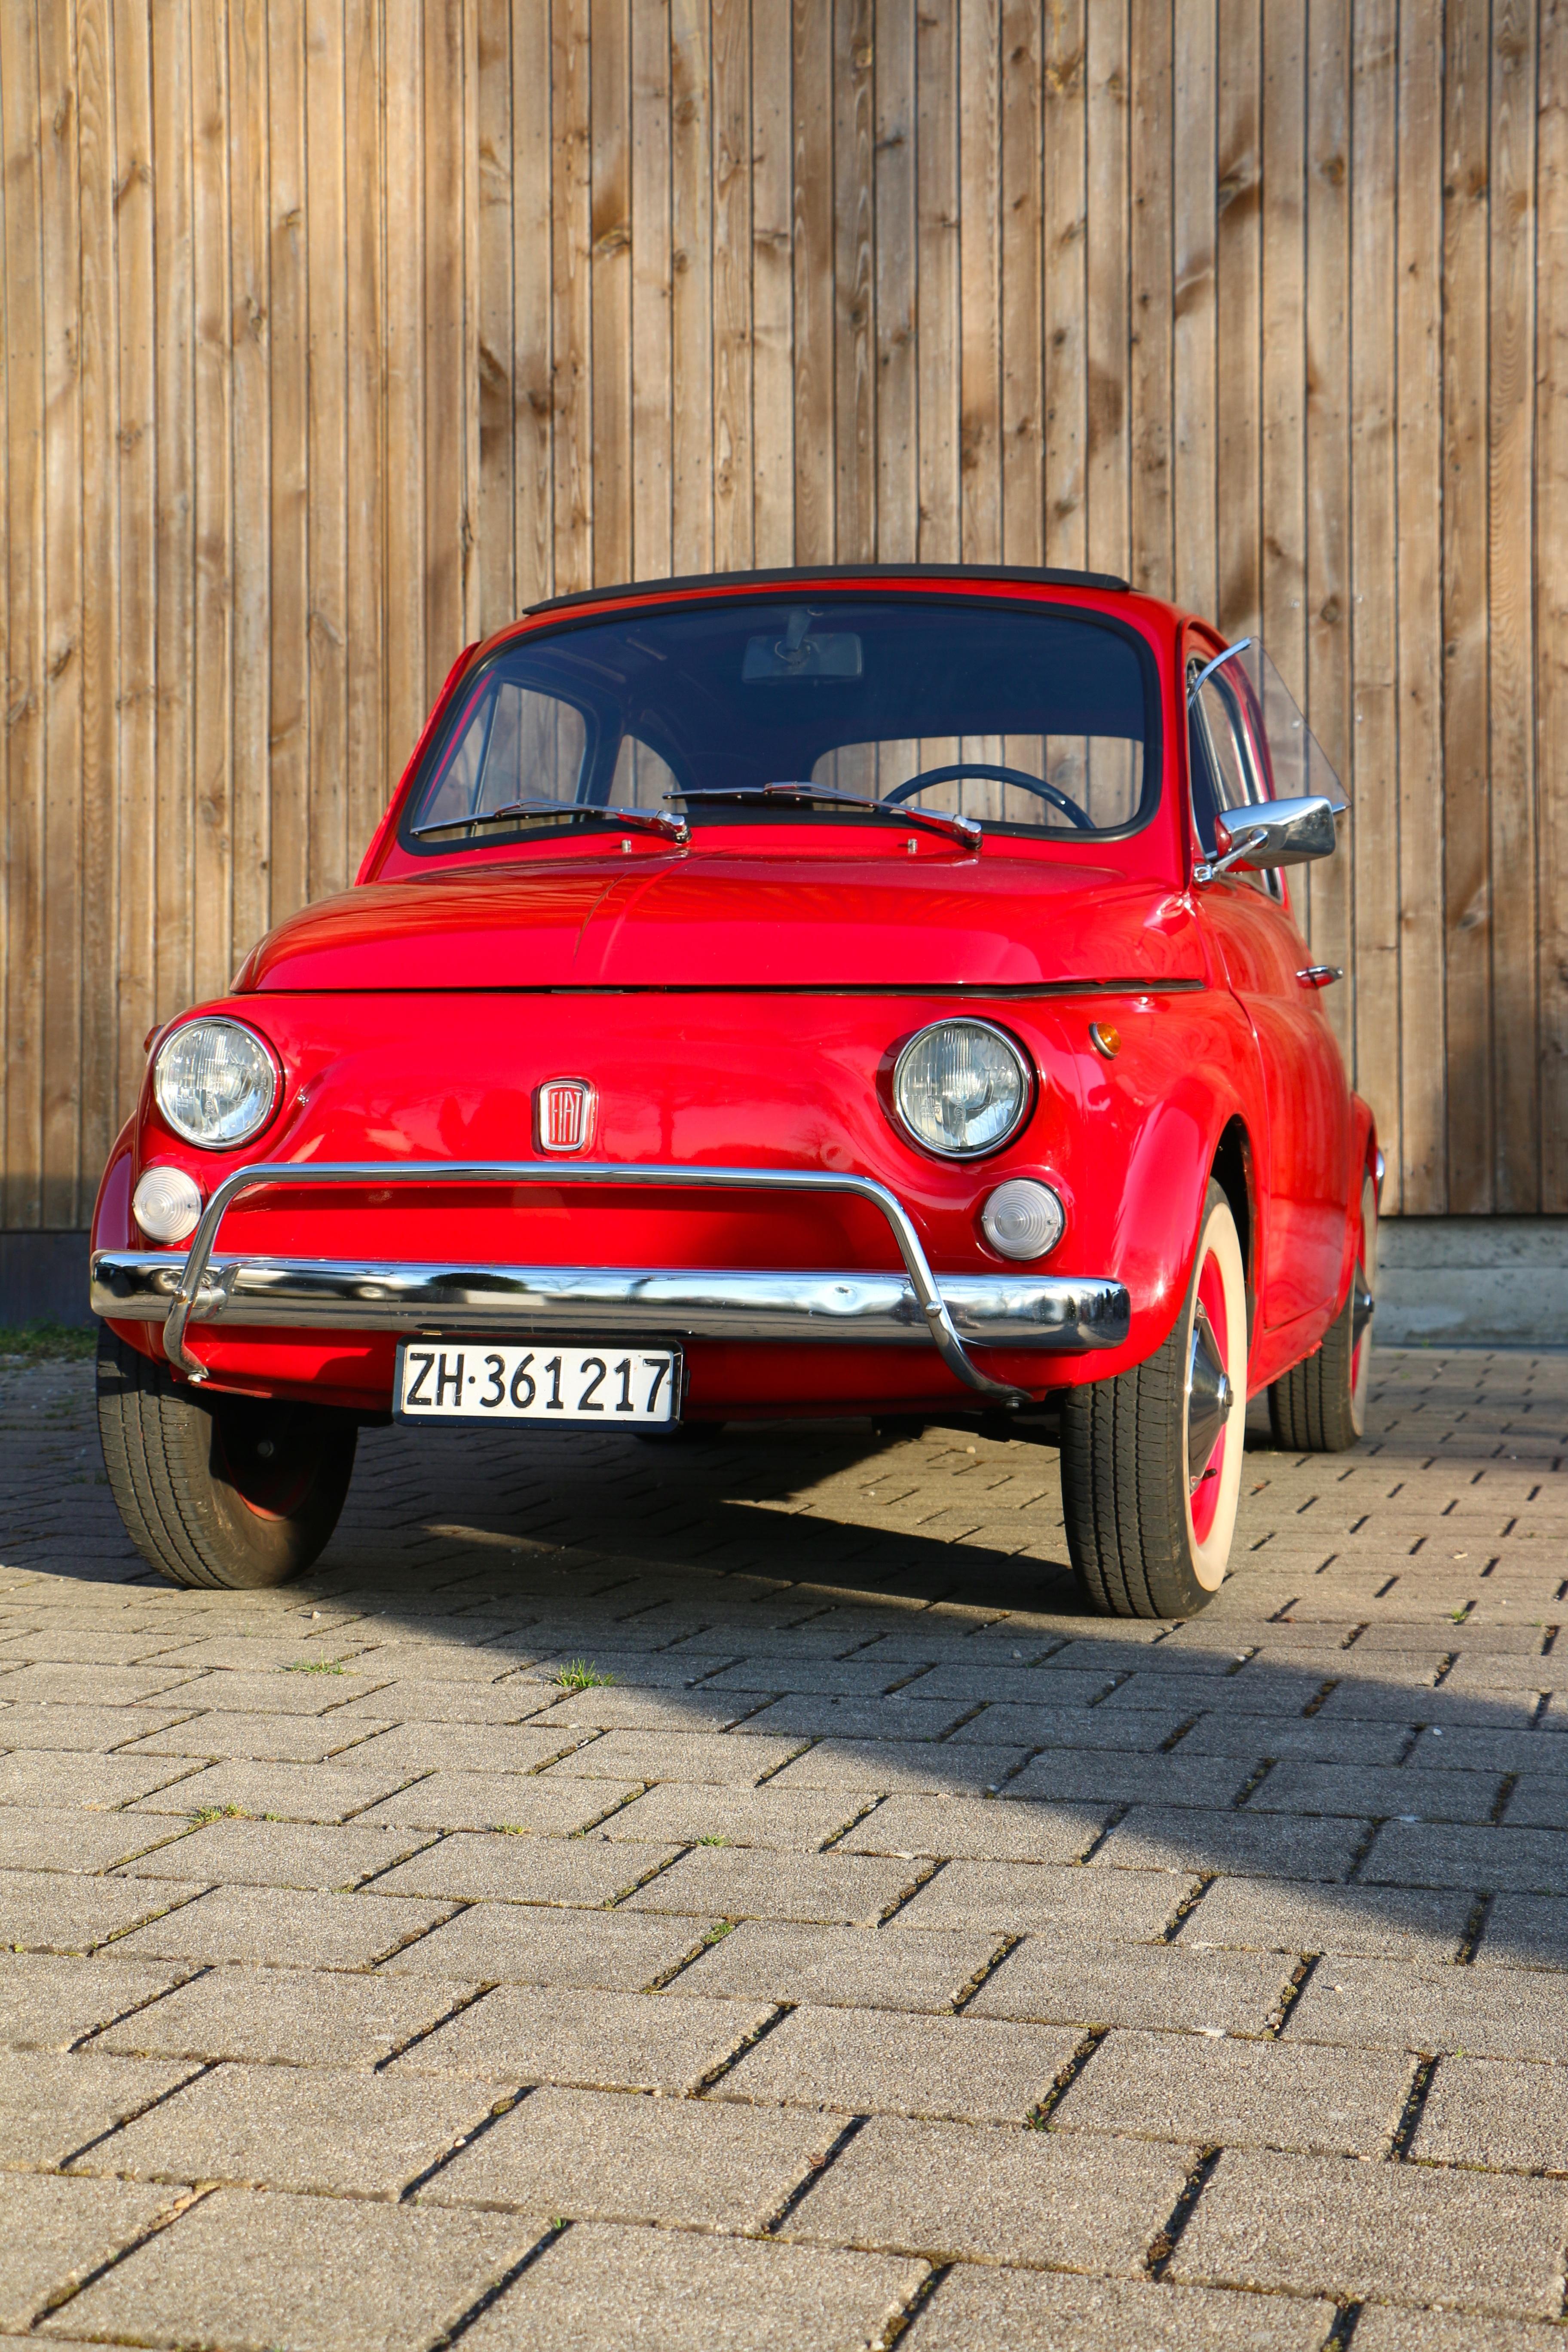 images gratuites rouge v hicule nostalgie voiture classique voiture ancienne fiat 500. Black Bedroom Furniture Sets. Home Design Ideas